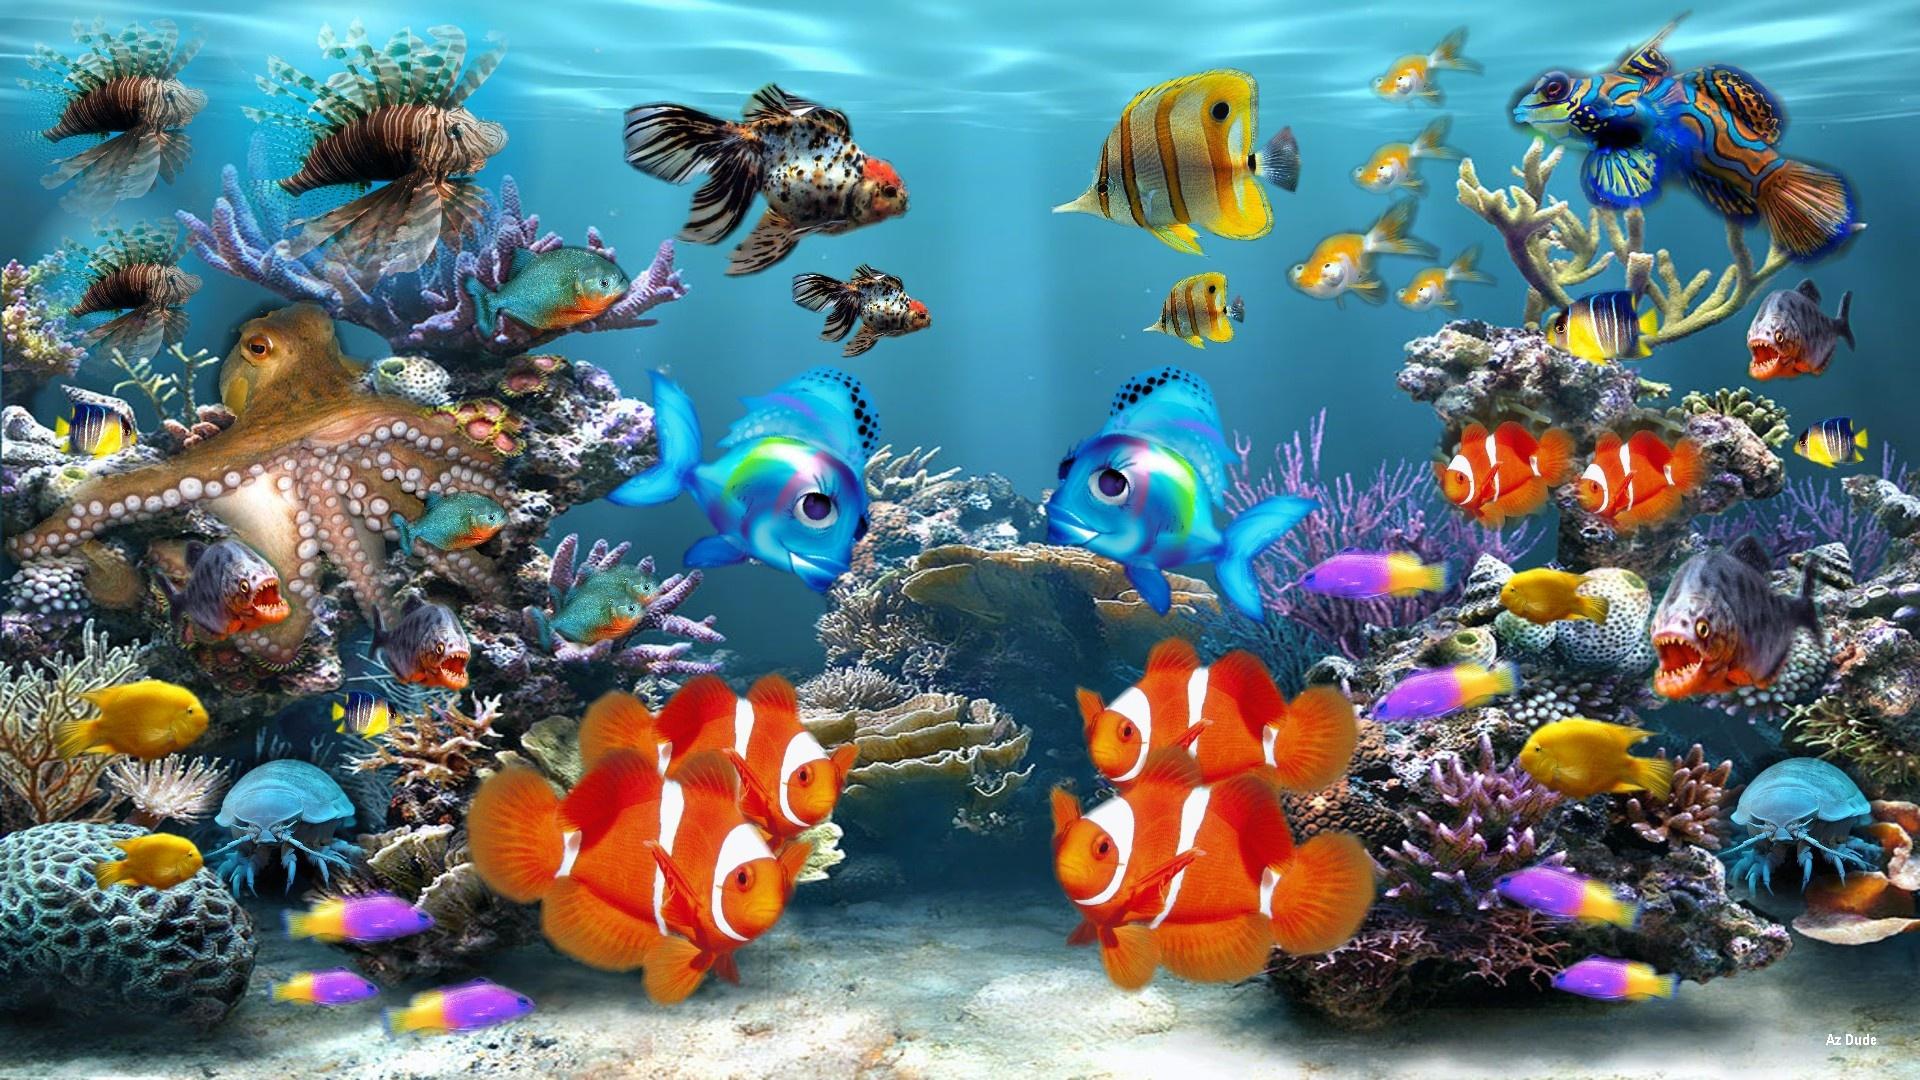 aquarium wallpapers for windows 8 wallpapersafarifonds dcran aquarium pc et tablettes ipad etc 1920x1080